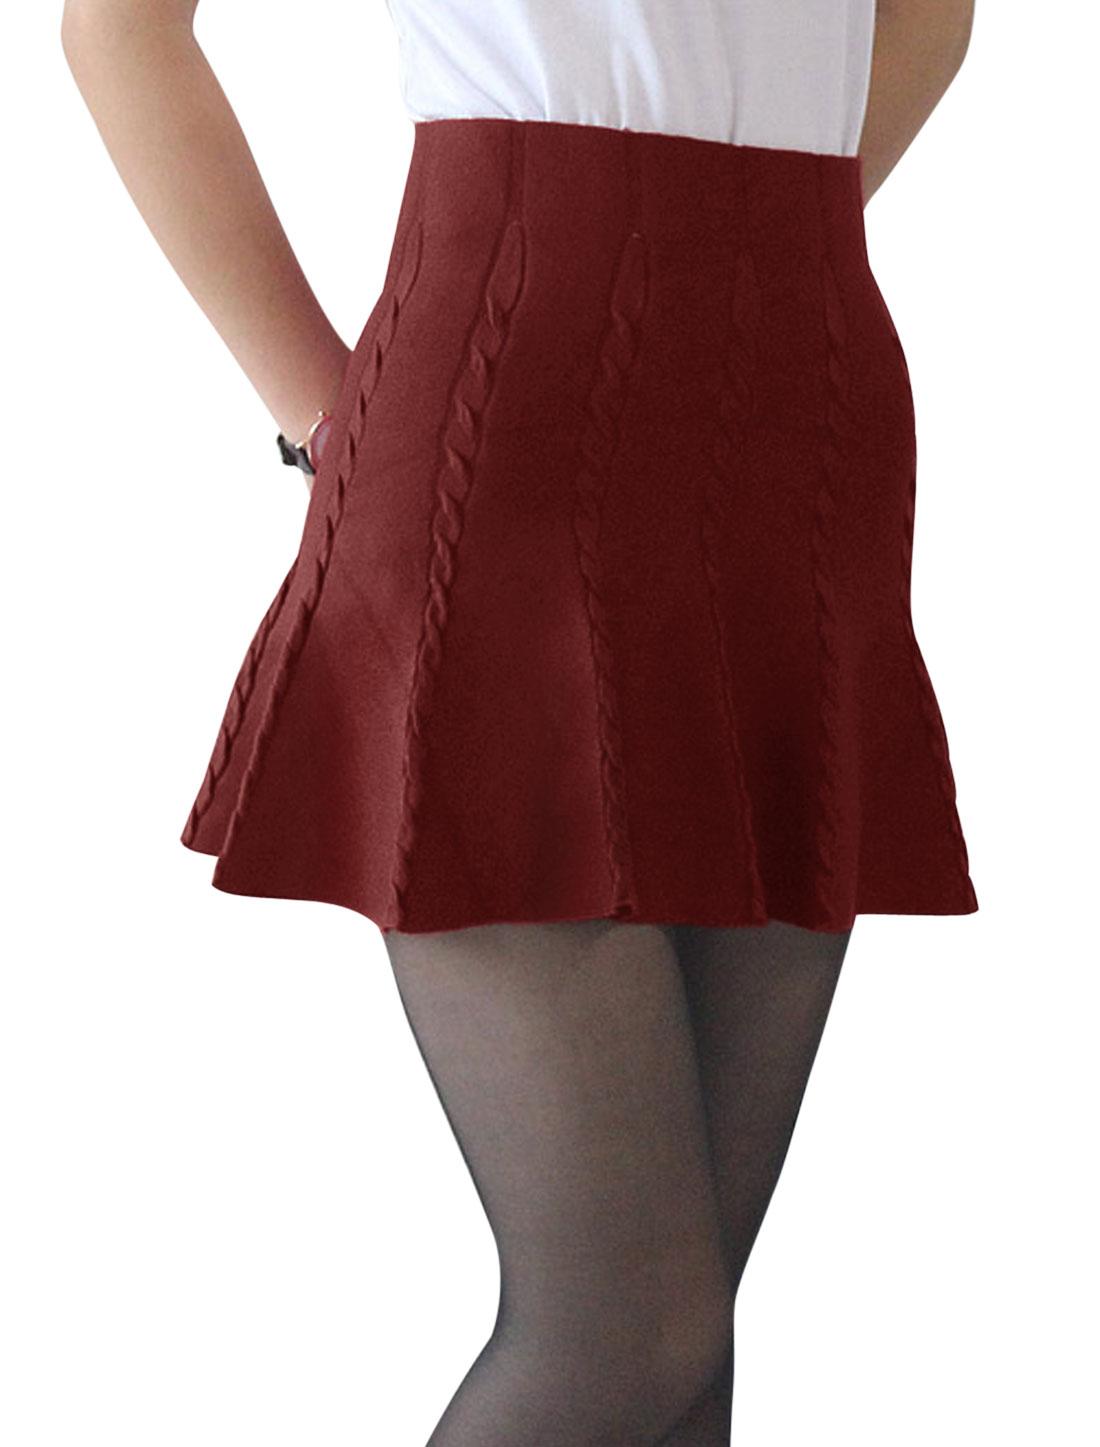 Women High Waist Braided Design Mini Knit Full Skirt Burgundy XS